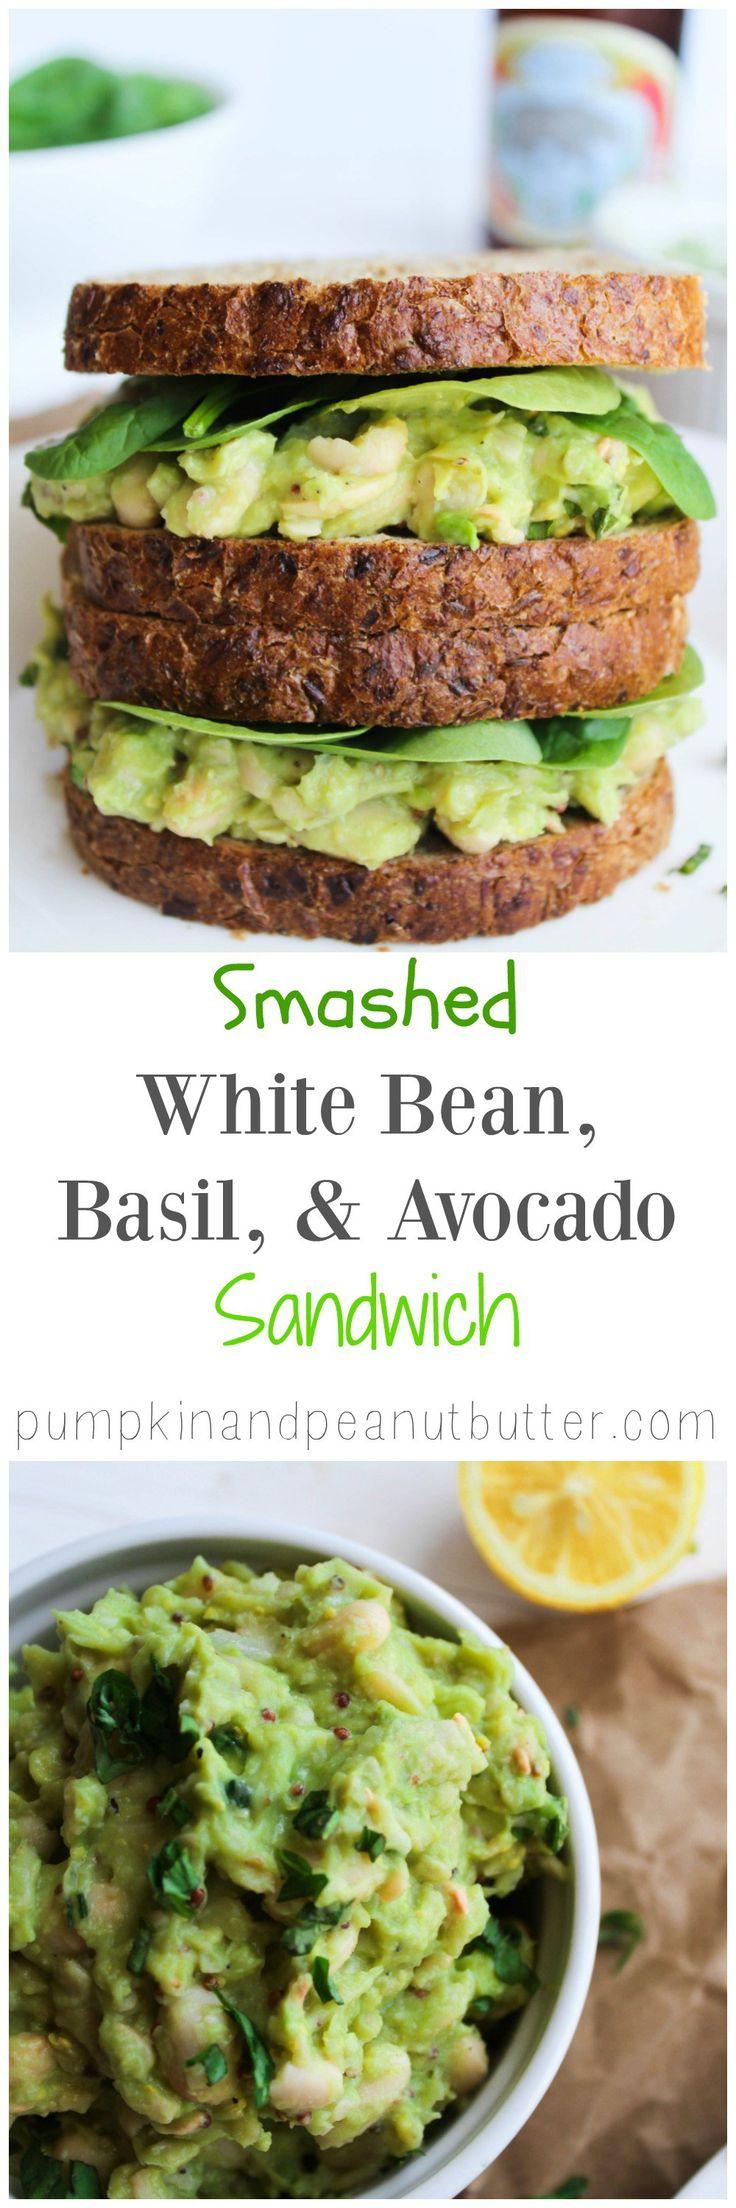 Smashed White Bean, Basil, & Avocado Sandwich {vegan, gluten free} // pumpkinandpeanutbutter.com #food #foodblogger